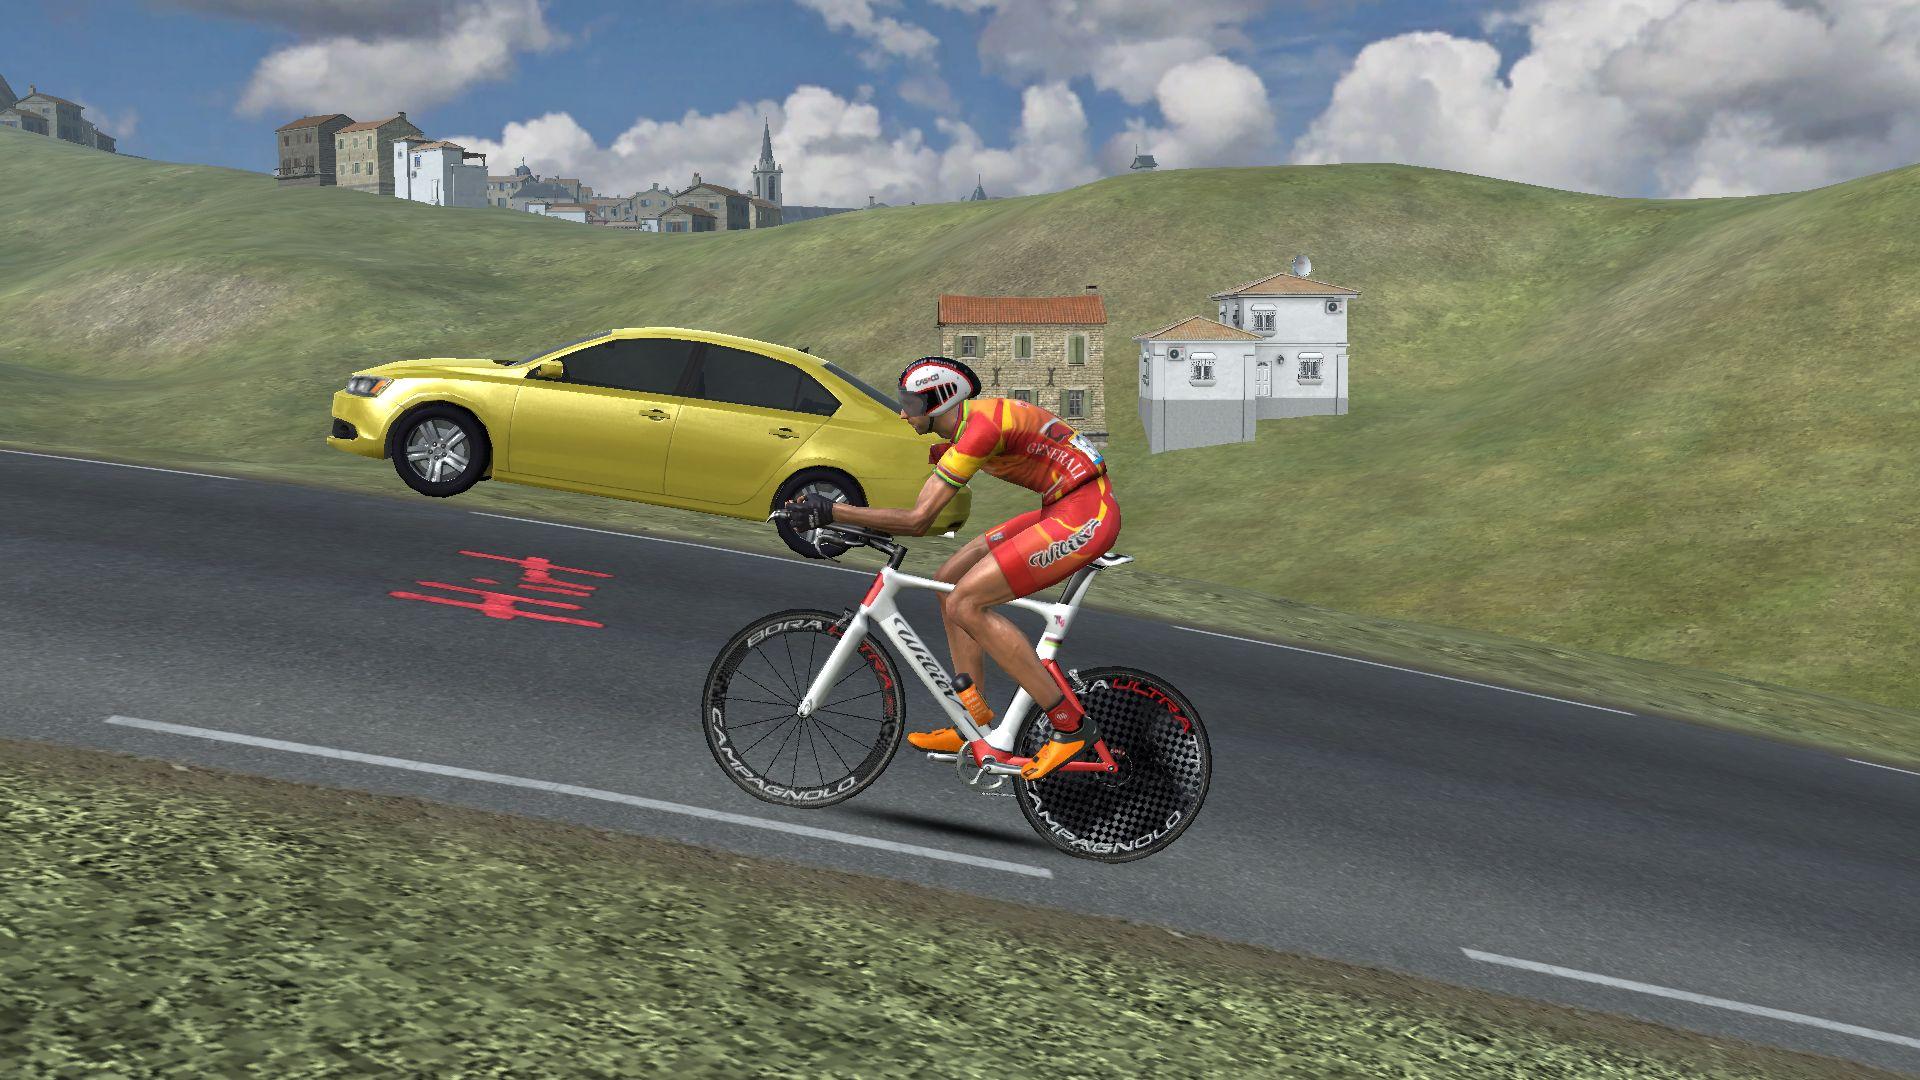 pcmdaily.com/images/mg/2019/Races/GTM/Giro/mg19_giro_09_PCM0039.jpg